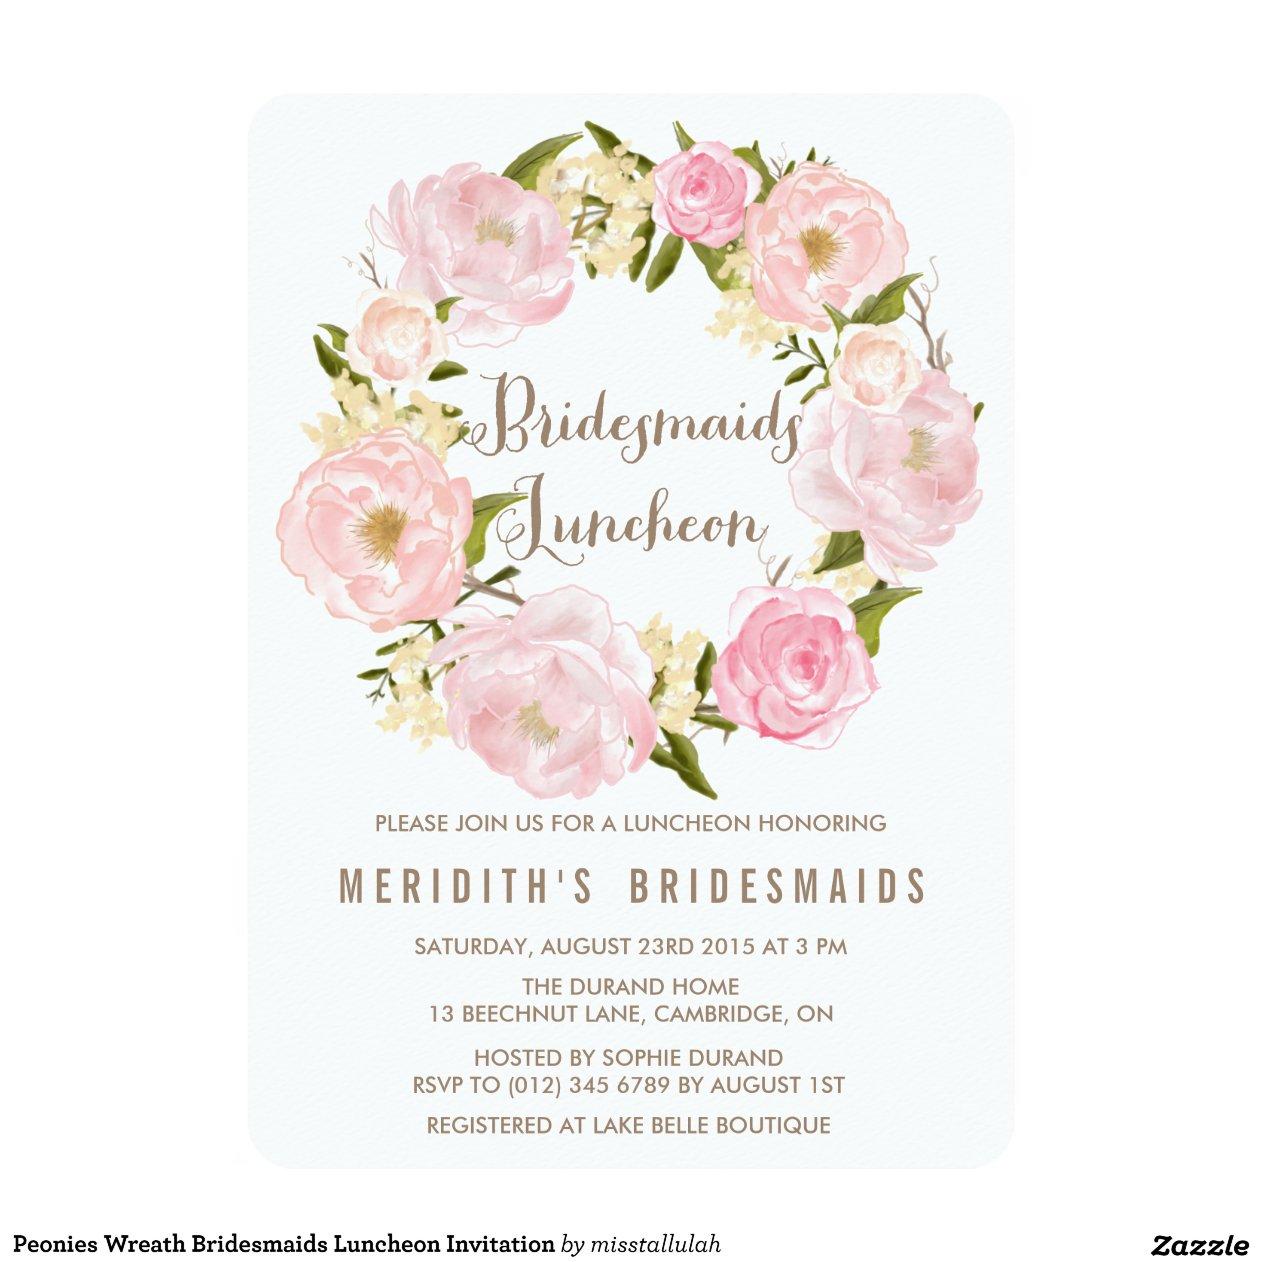 peonies_wreath_bridesmaids_luncheon_invitation ...